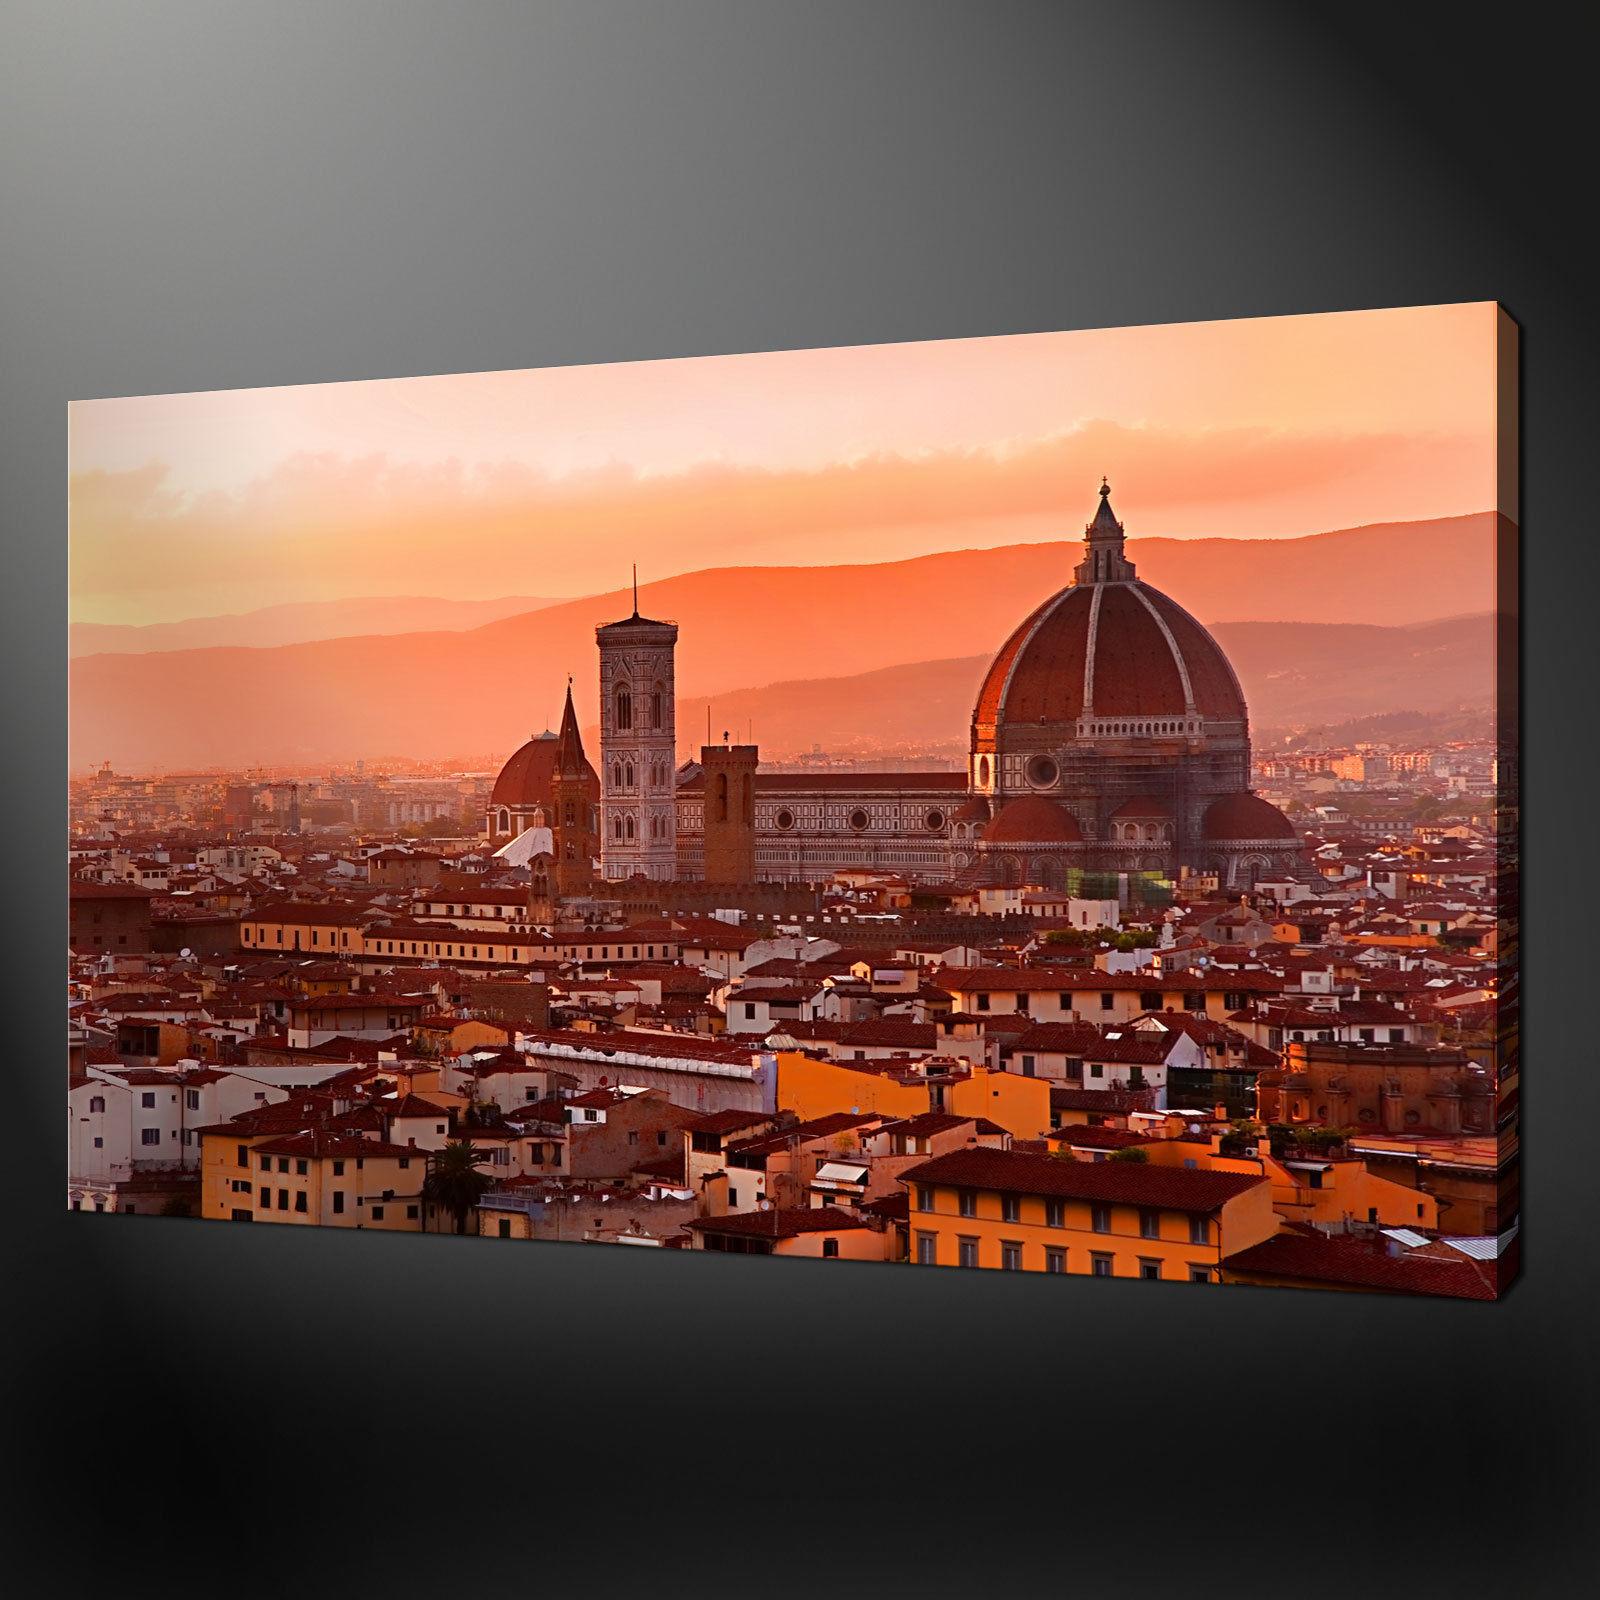 FIRENZE Panorama Qualità Tela Stampa Immagine Modern Wall Art pronto da appendere